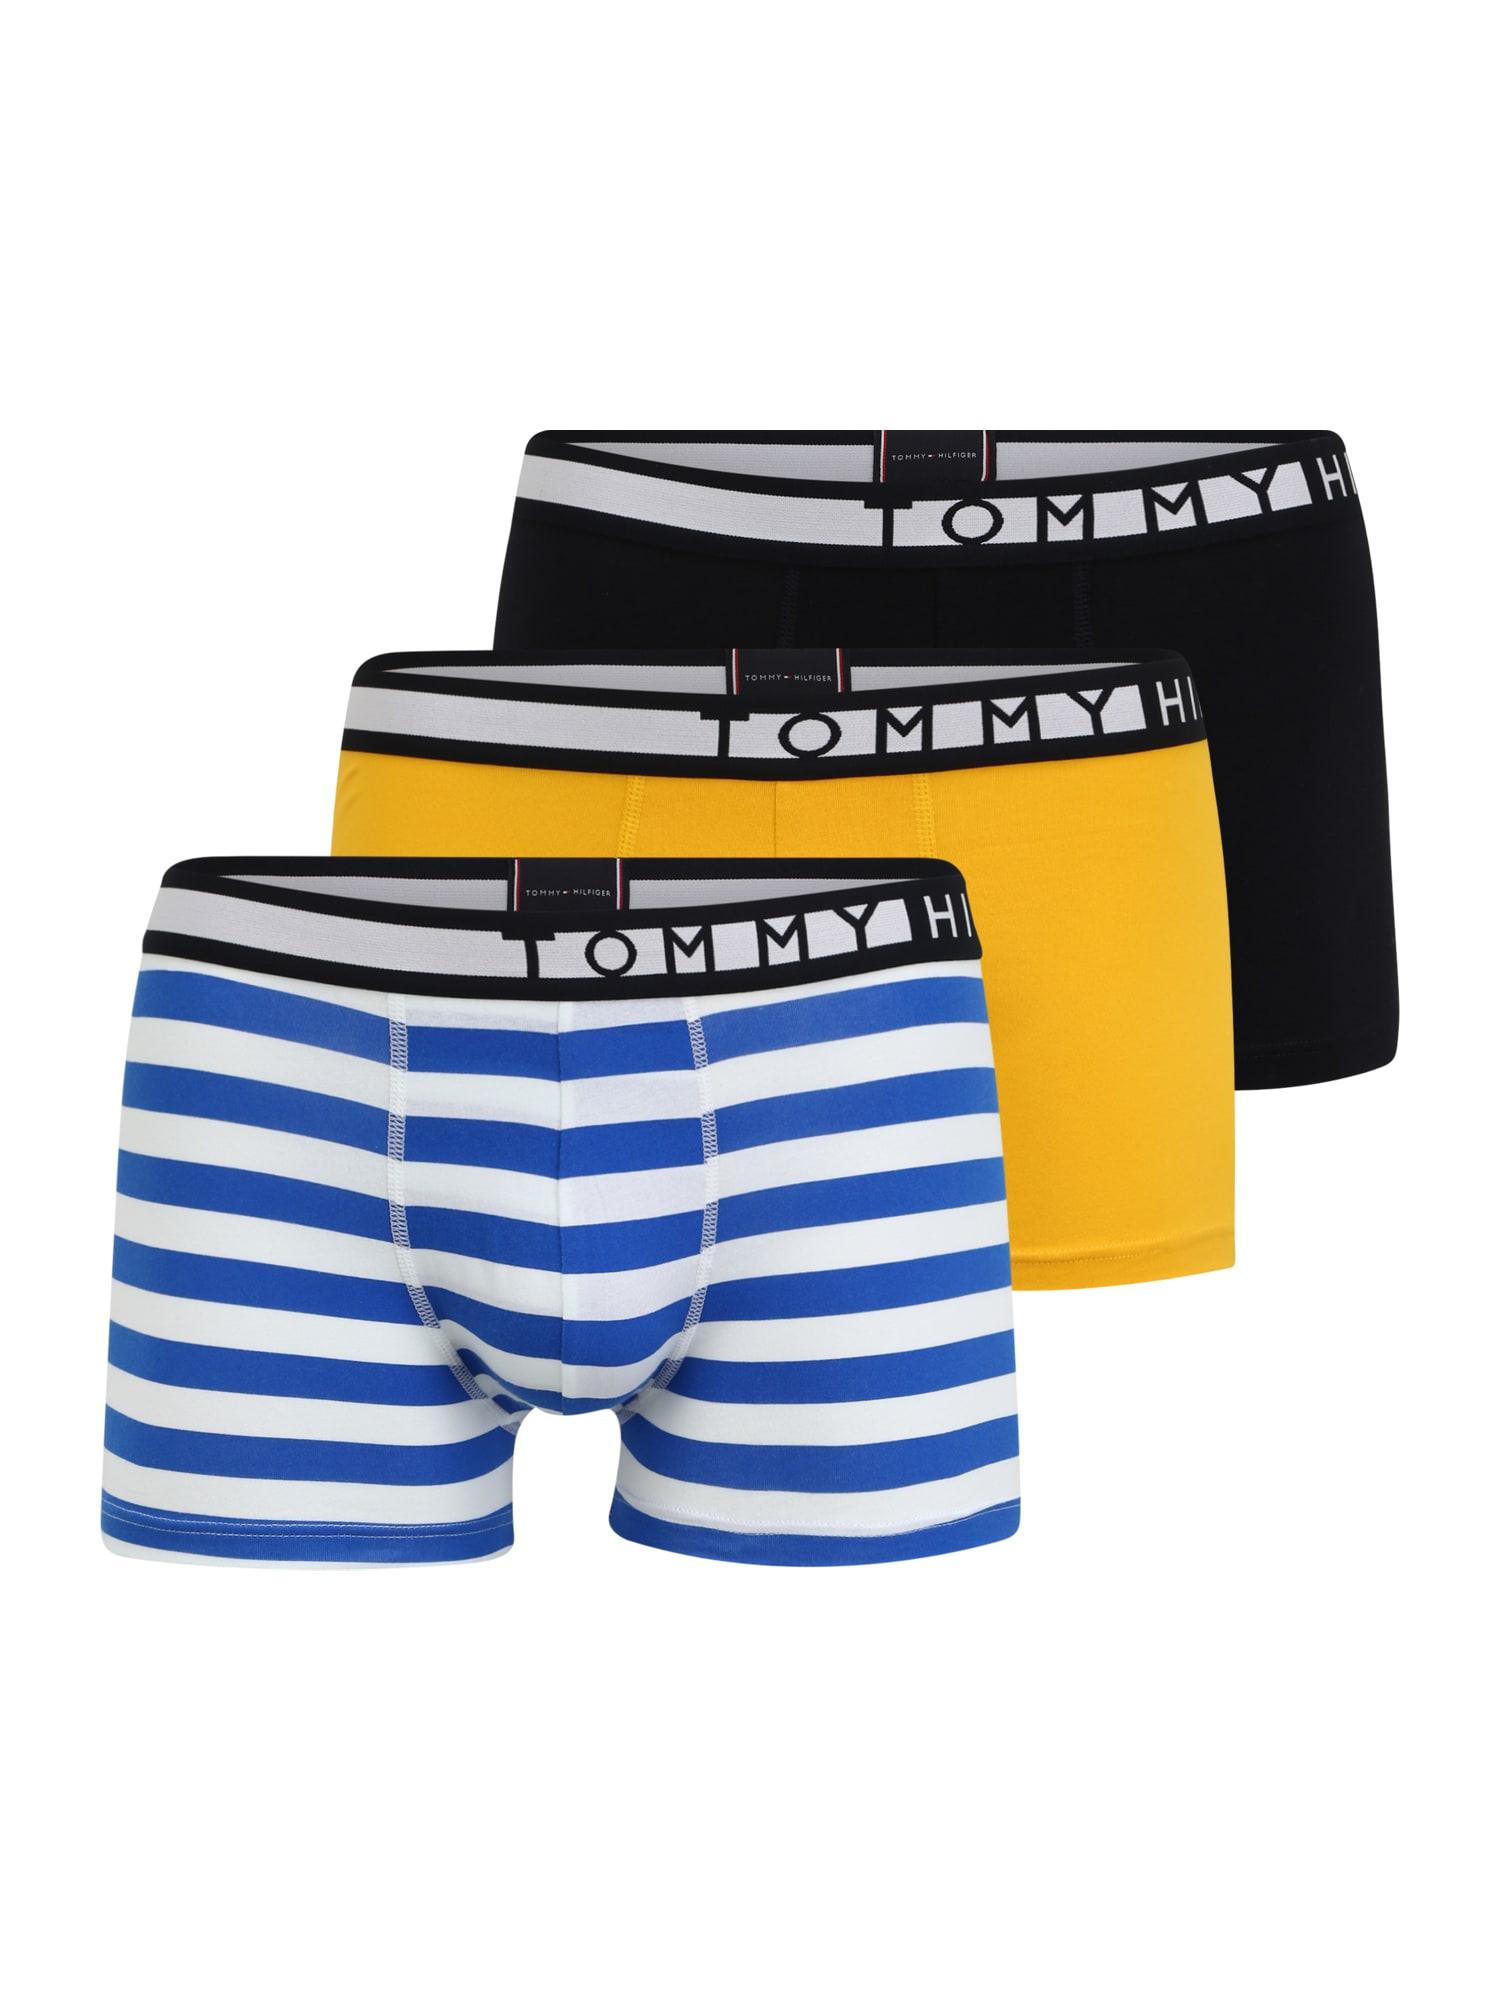 Tommy Hilfiger Underwear Boxer trumpikės geltona / mėlyna dūmų spalva / balta / kobalto mėlyna